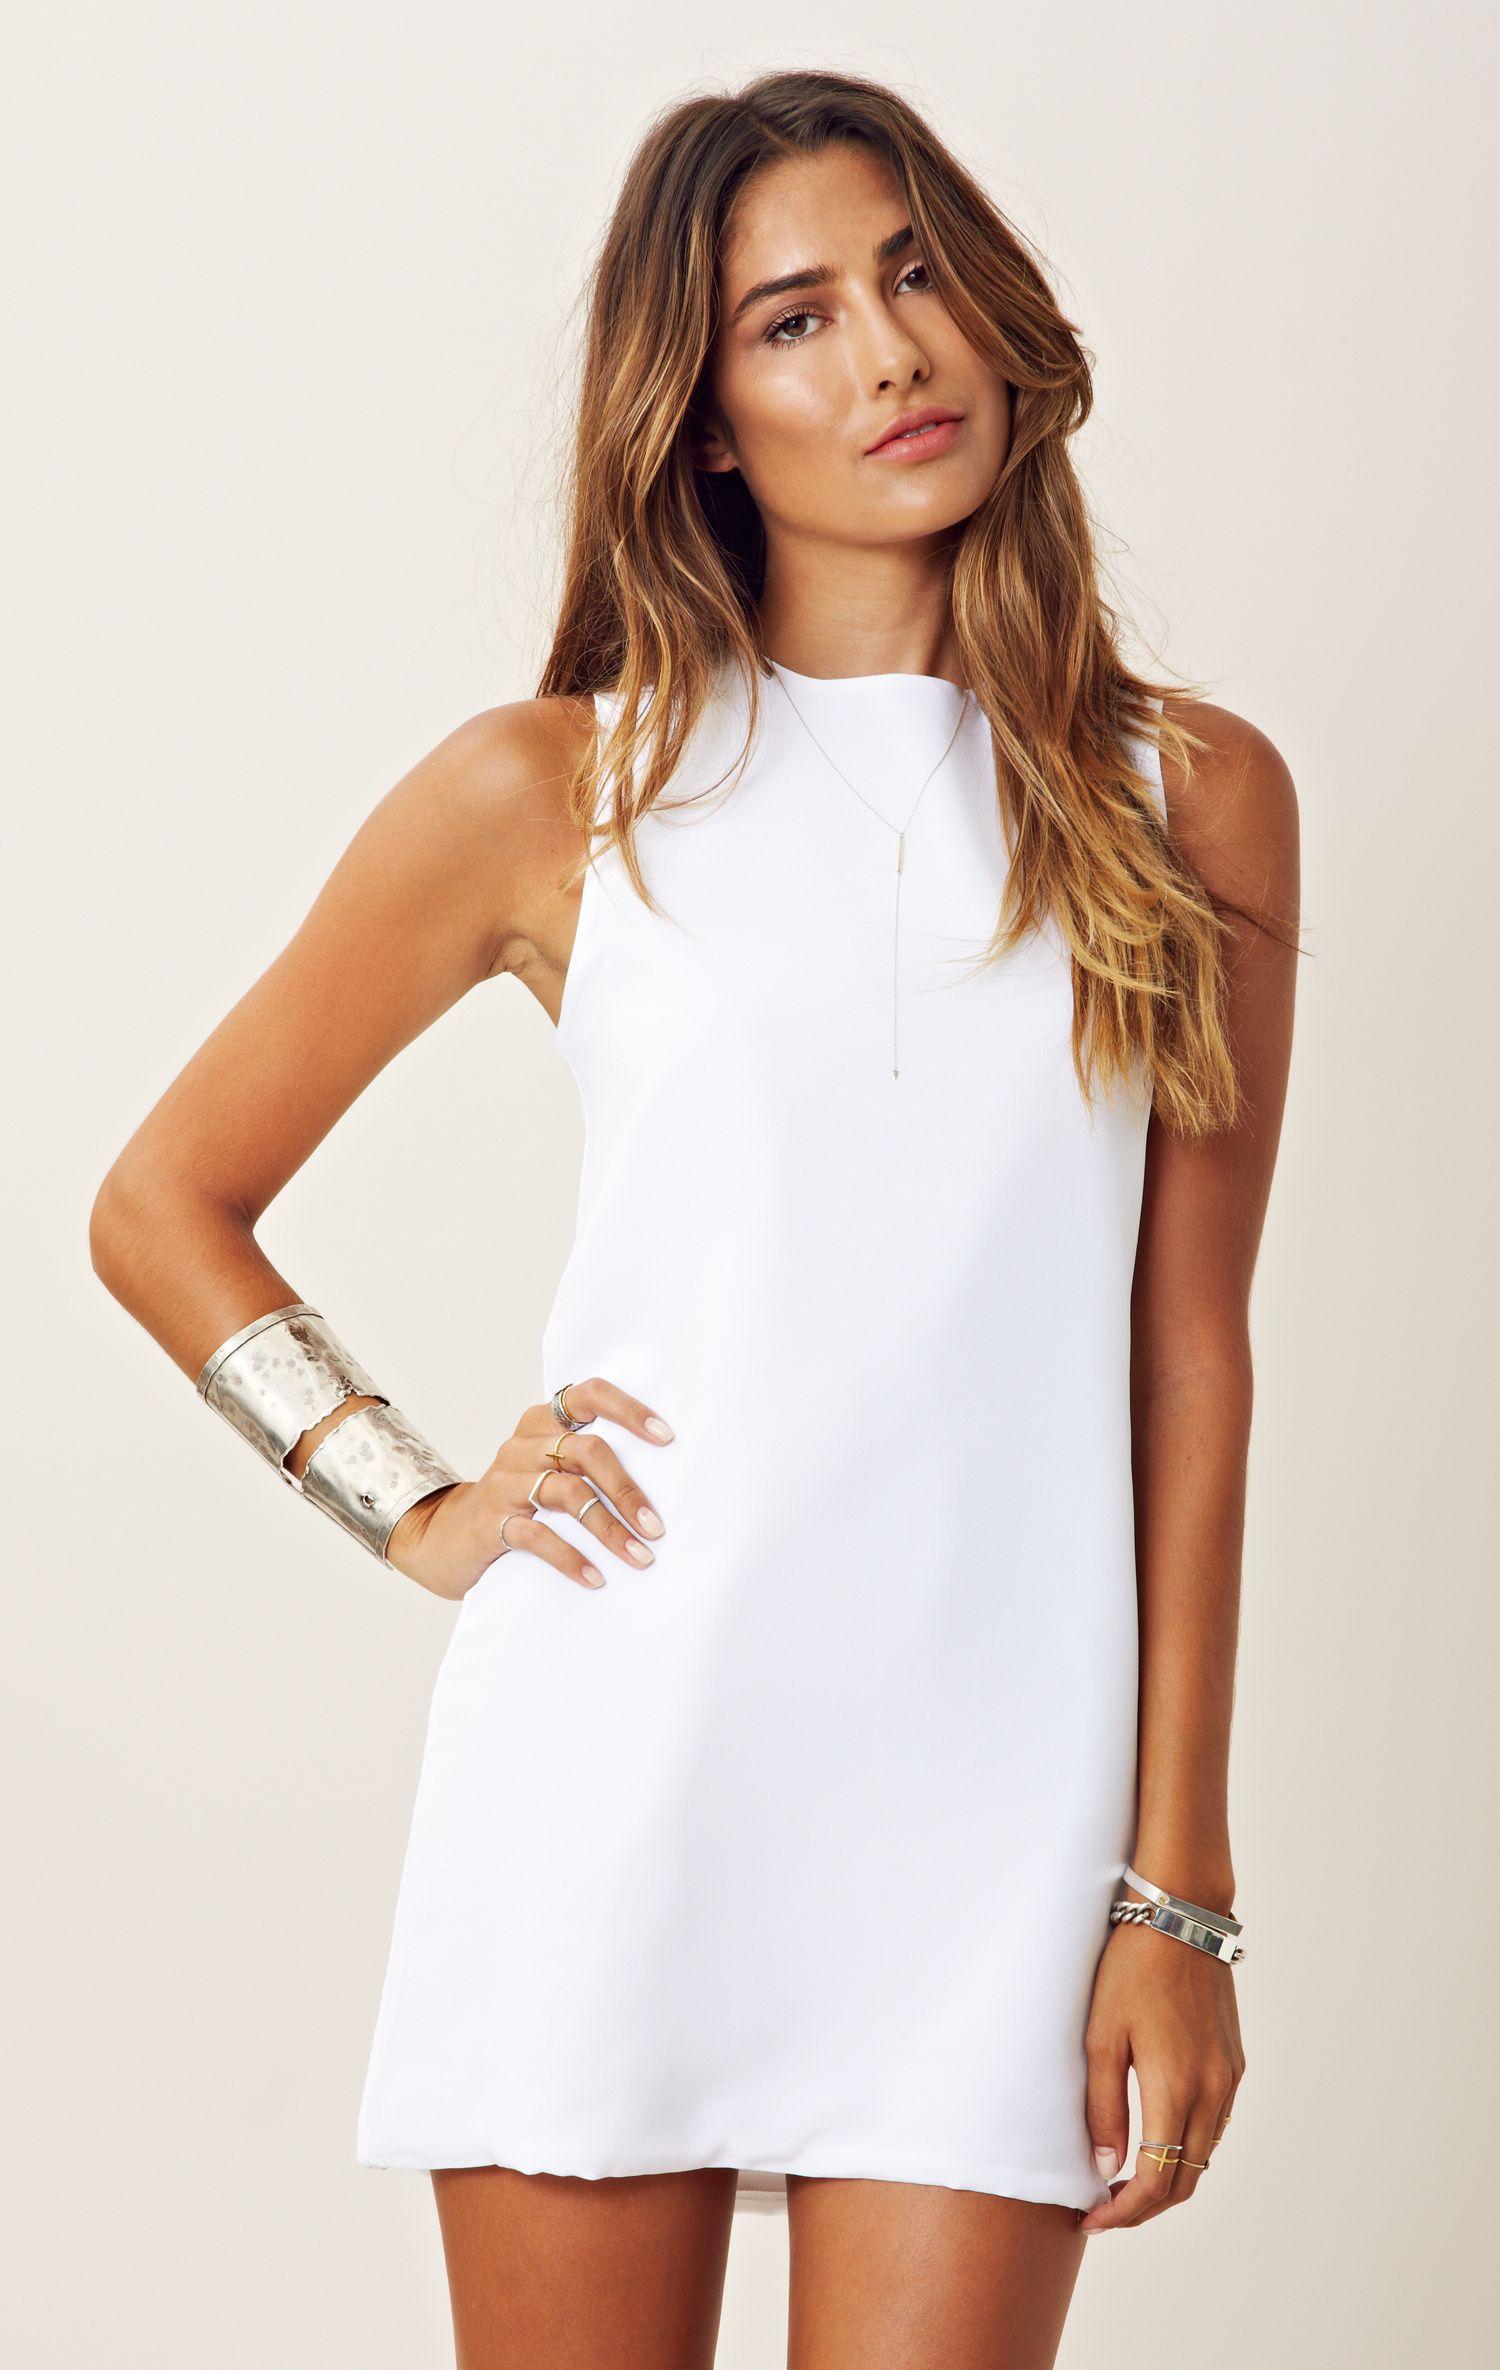 Twiggy Dress Abitini Bianchi e5d2604cb2c